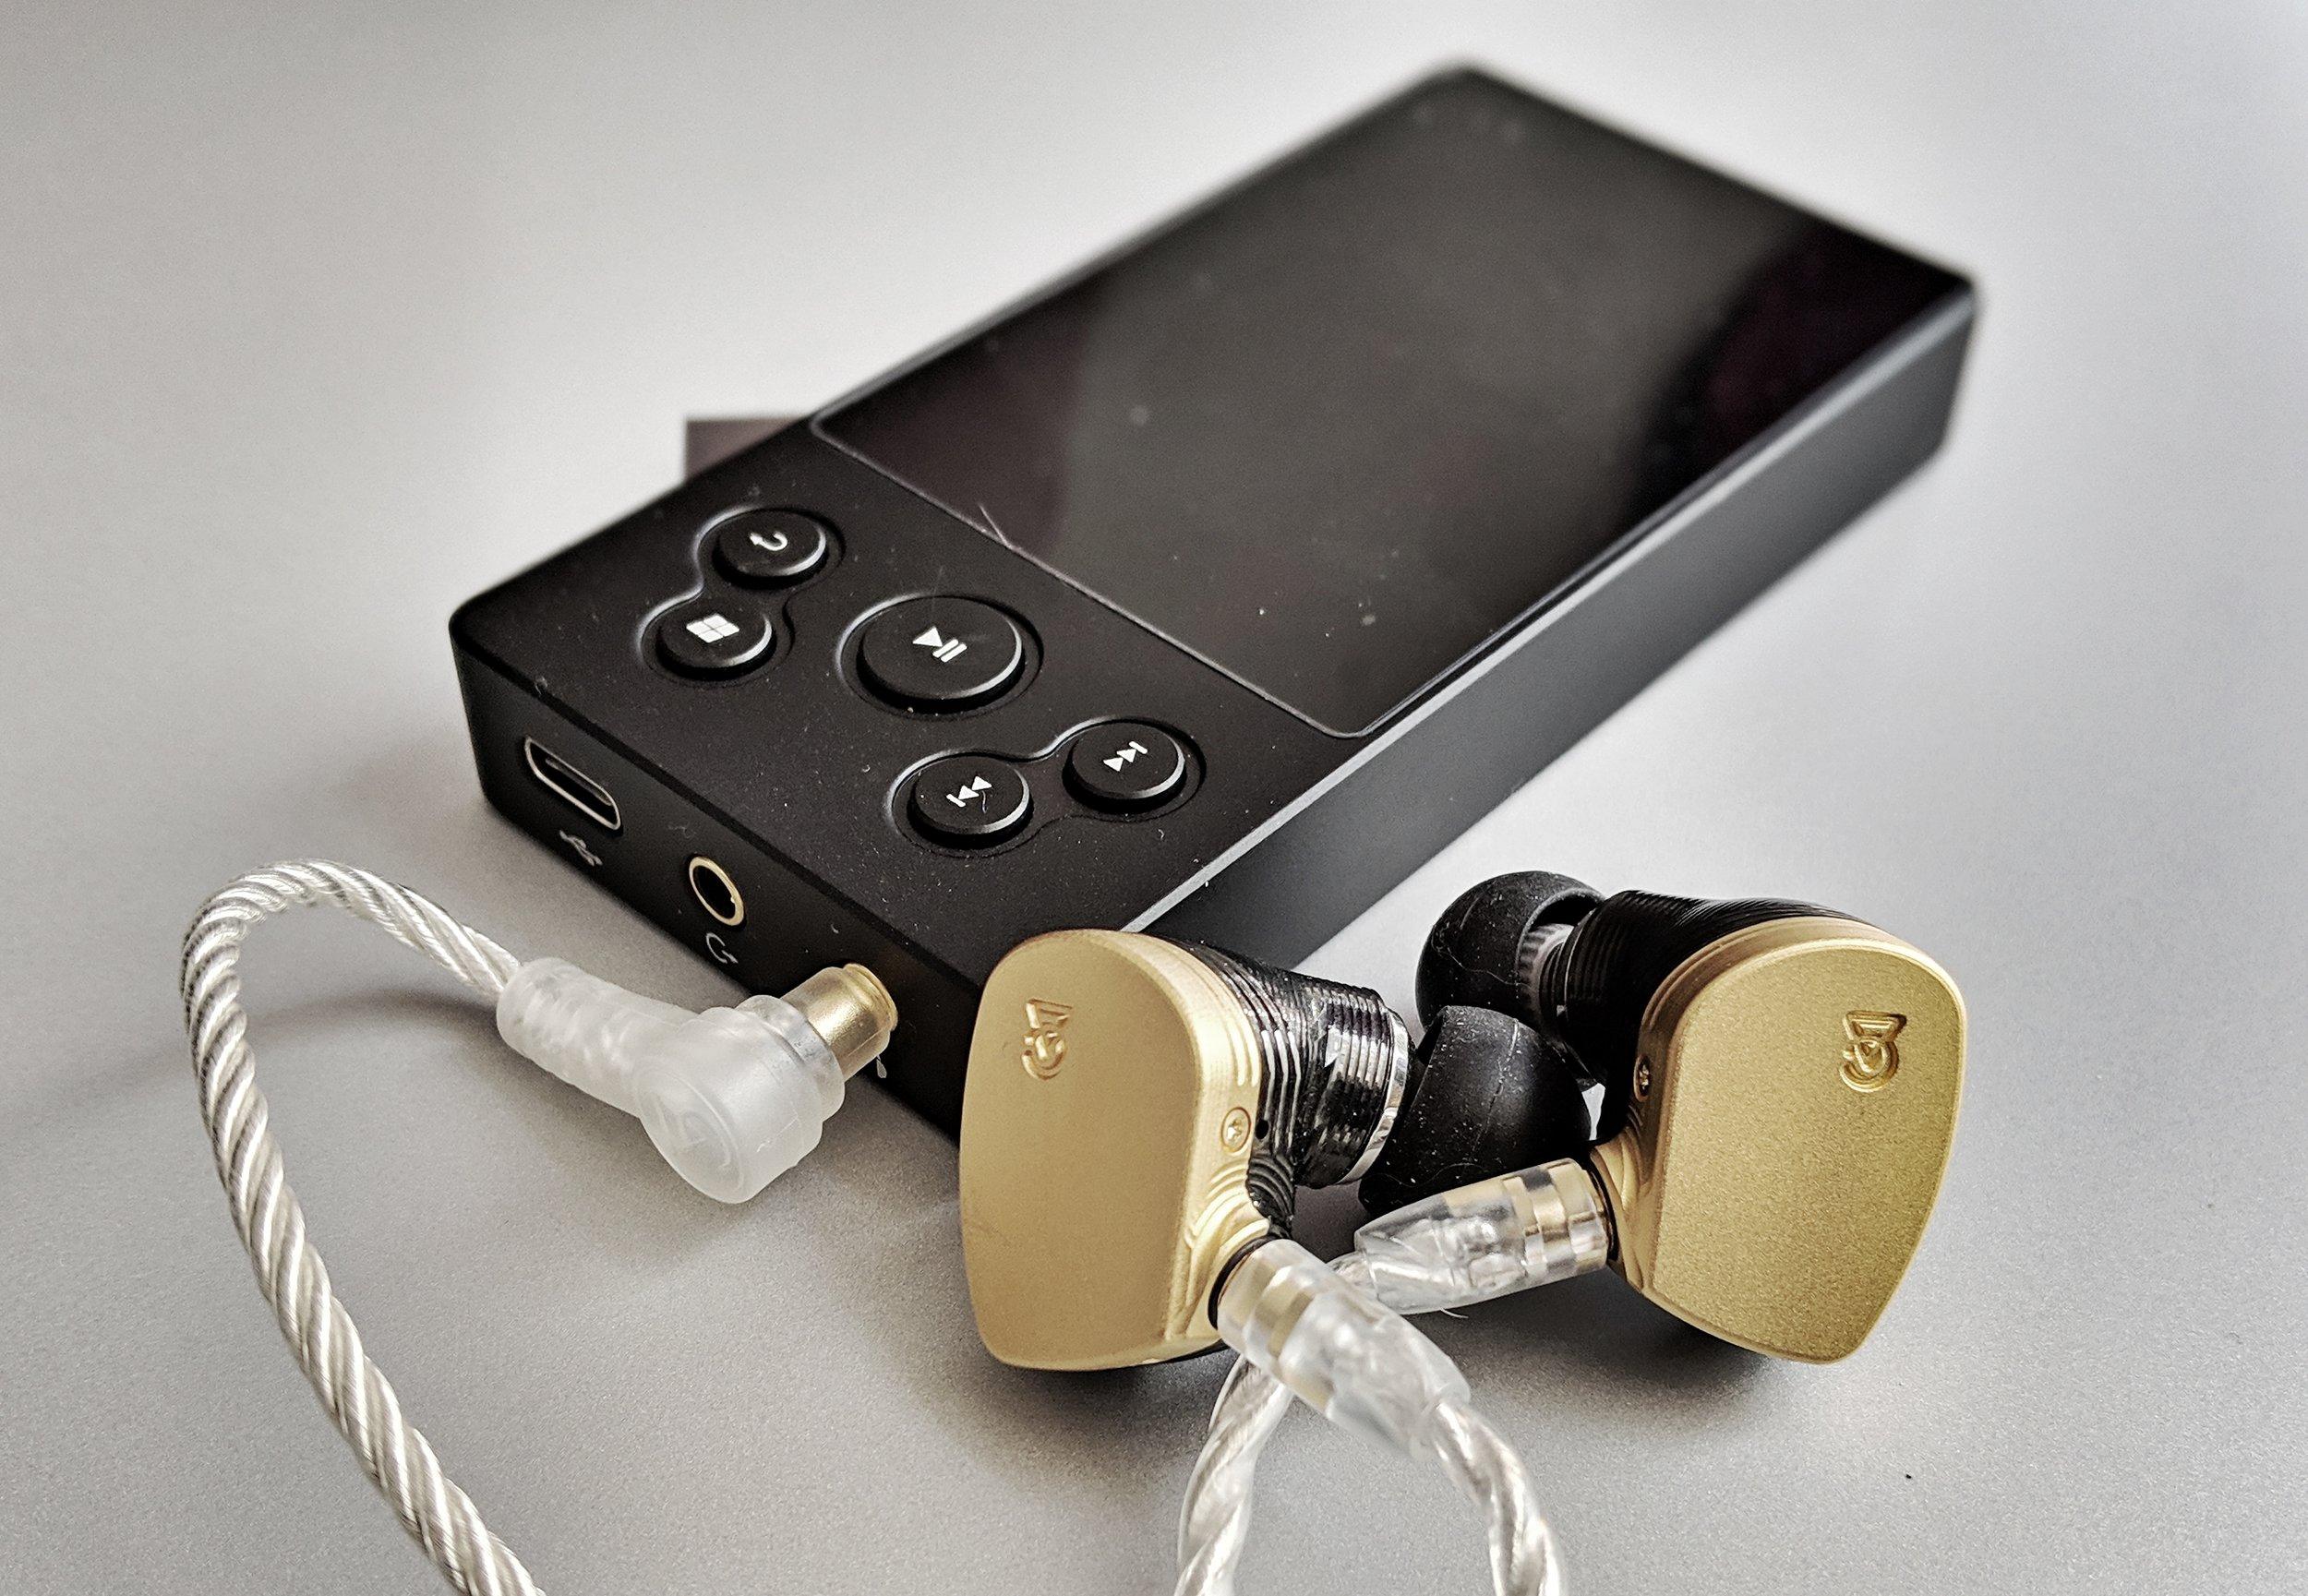 The Xduoo X3 II Audiophile DAP with the Campfire Audio Solaris Earphones.